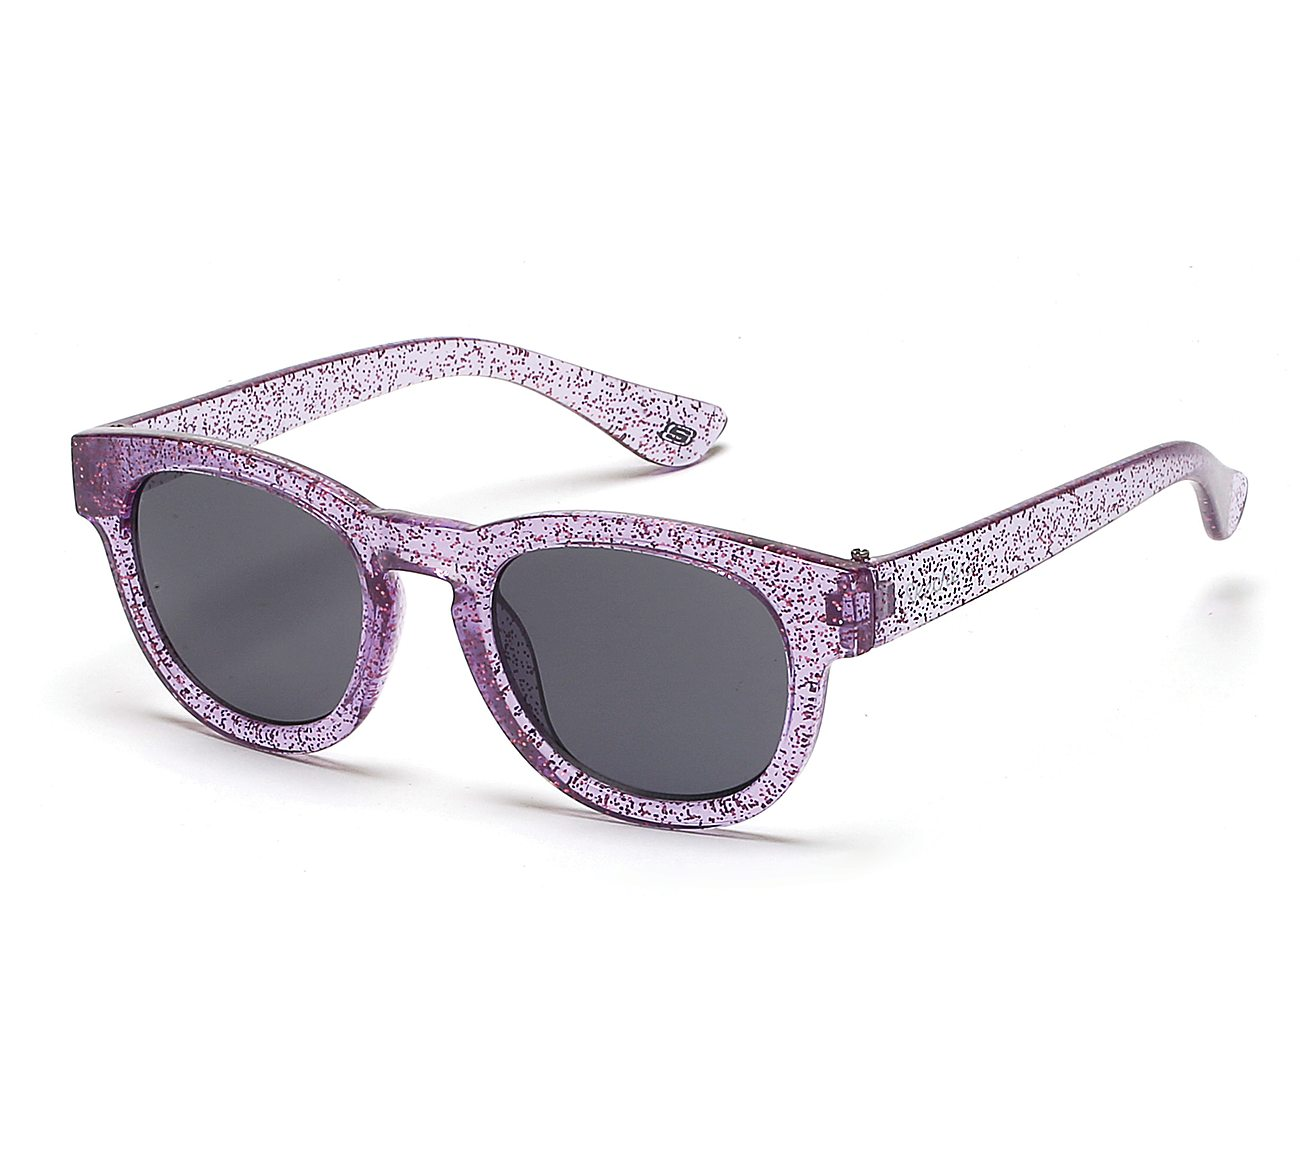 ff18f121592 Buy SKECHERS Glitter Wayfarer Sunglasses Accessories Shoes only  8.00